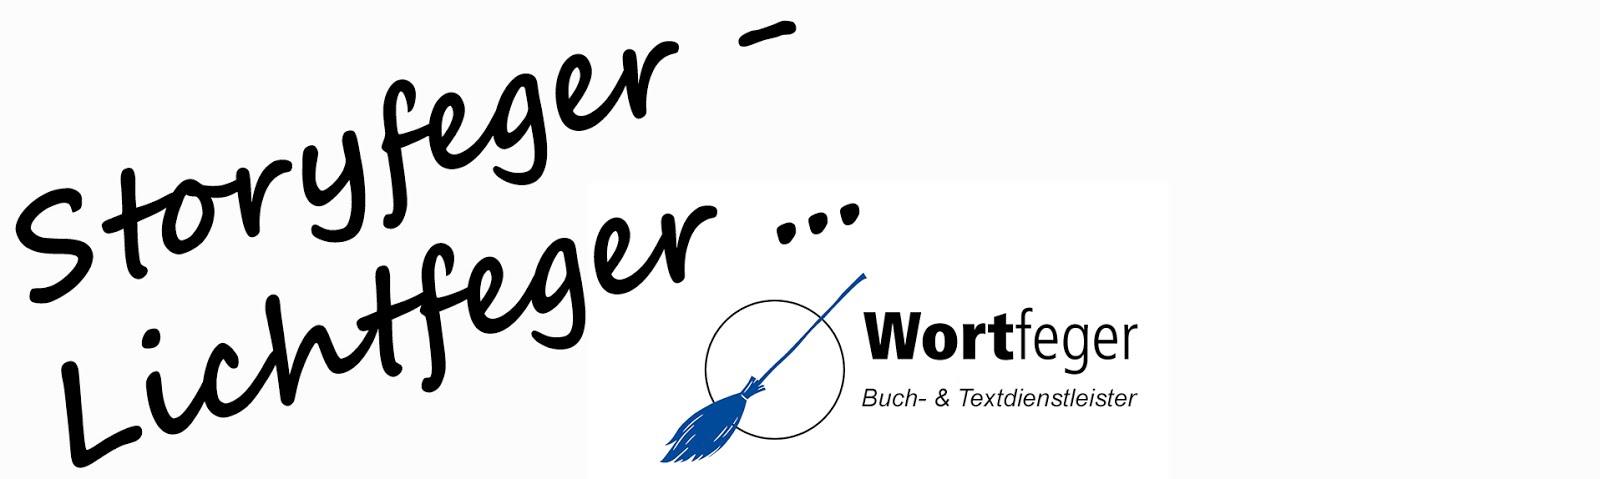 Wortfeger